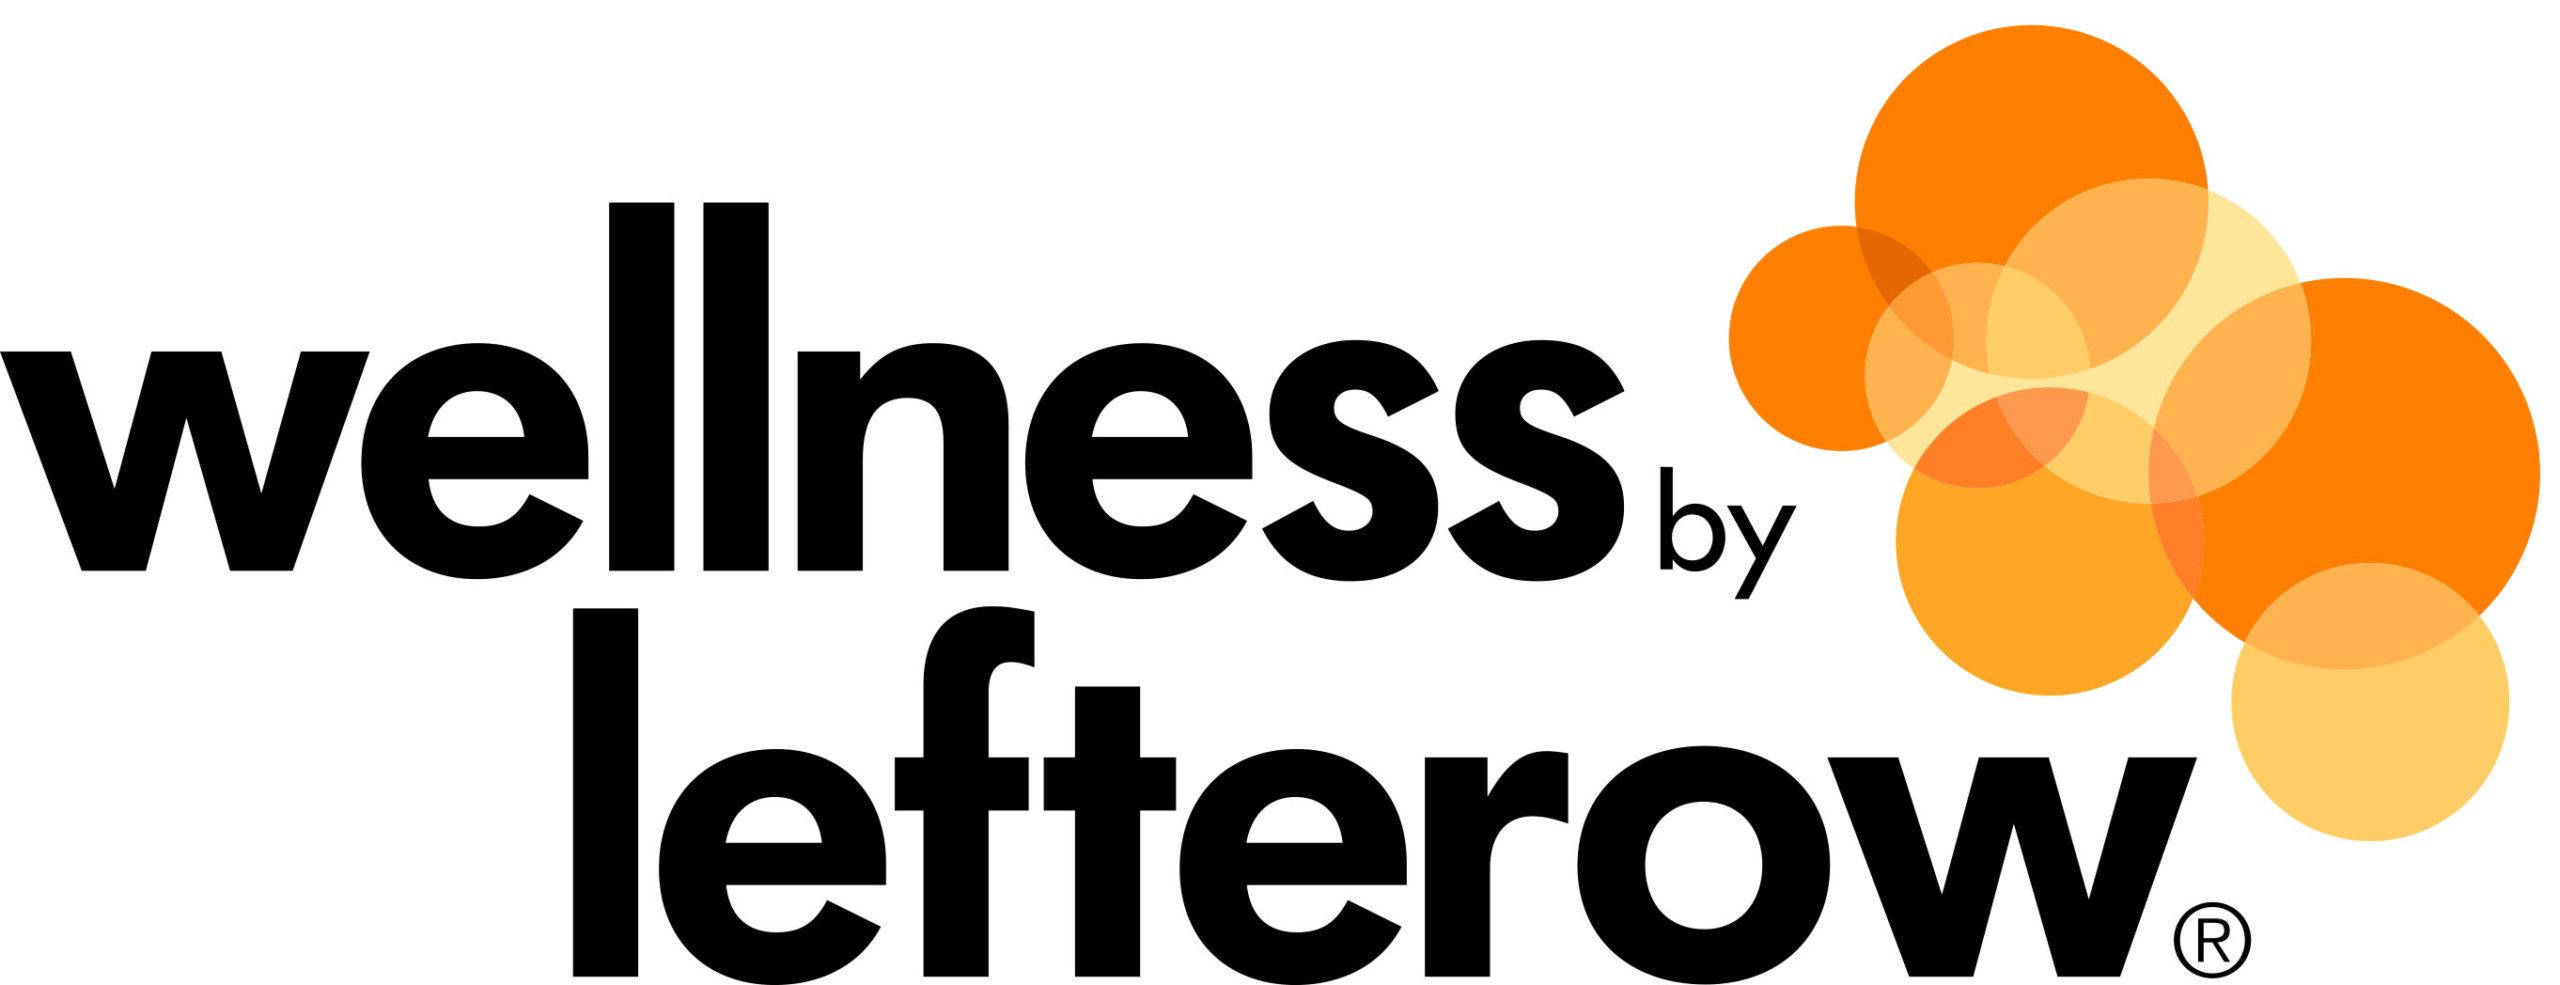 Wellness by Lefterow logotype